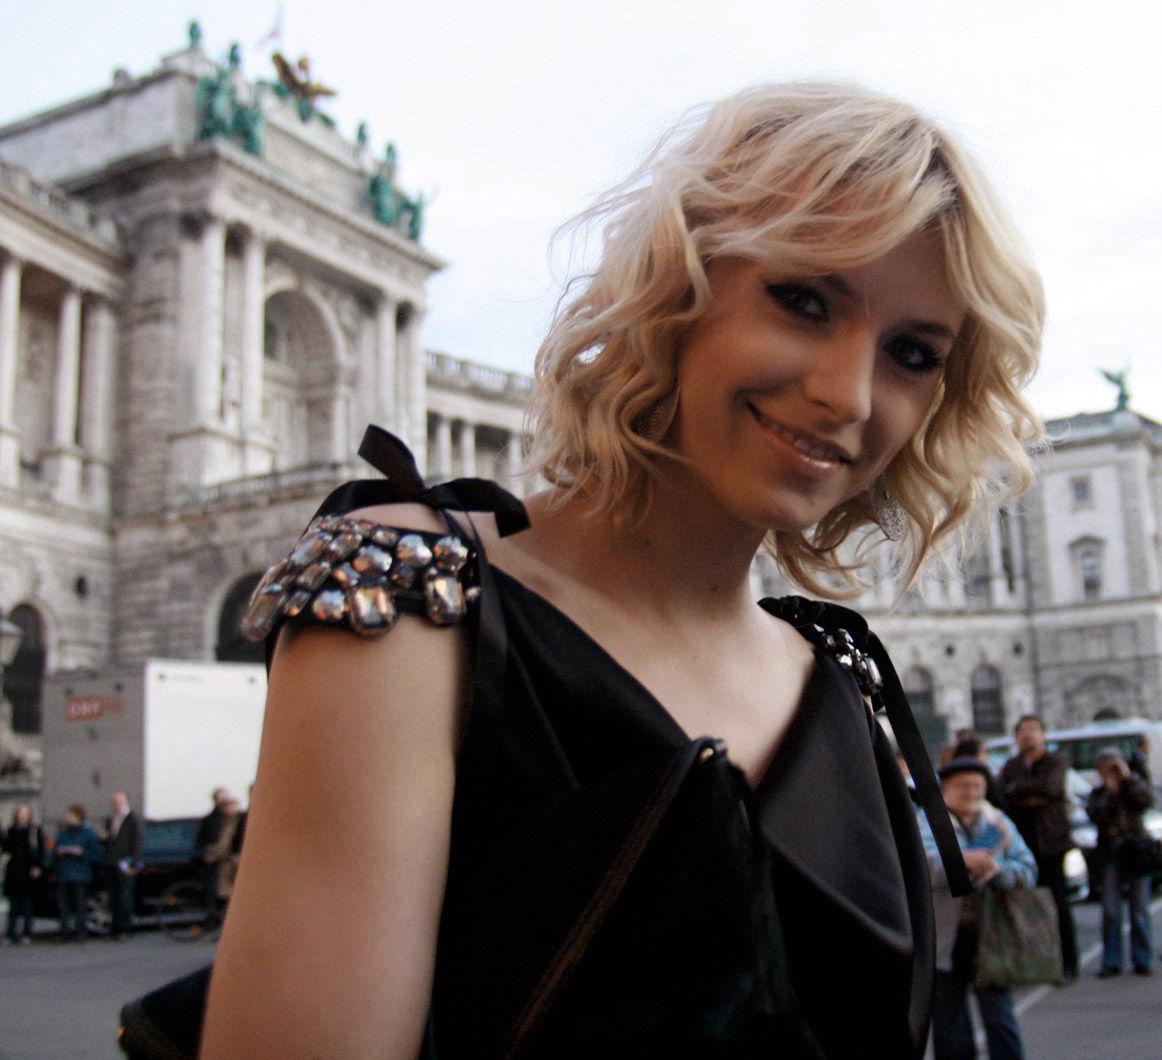 Photo of Lena Gercke: German model